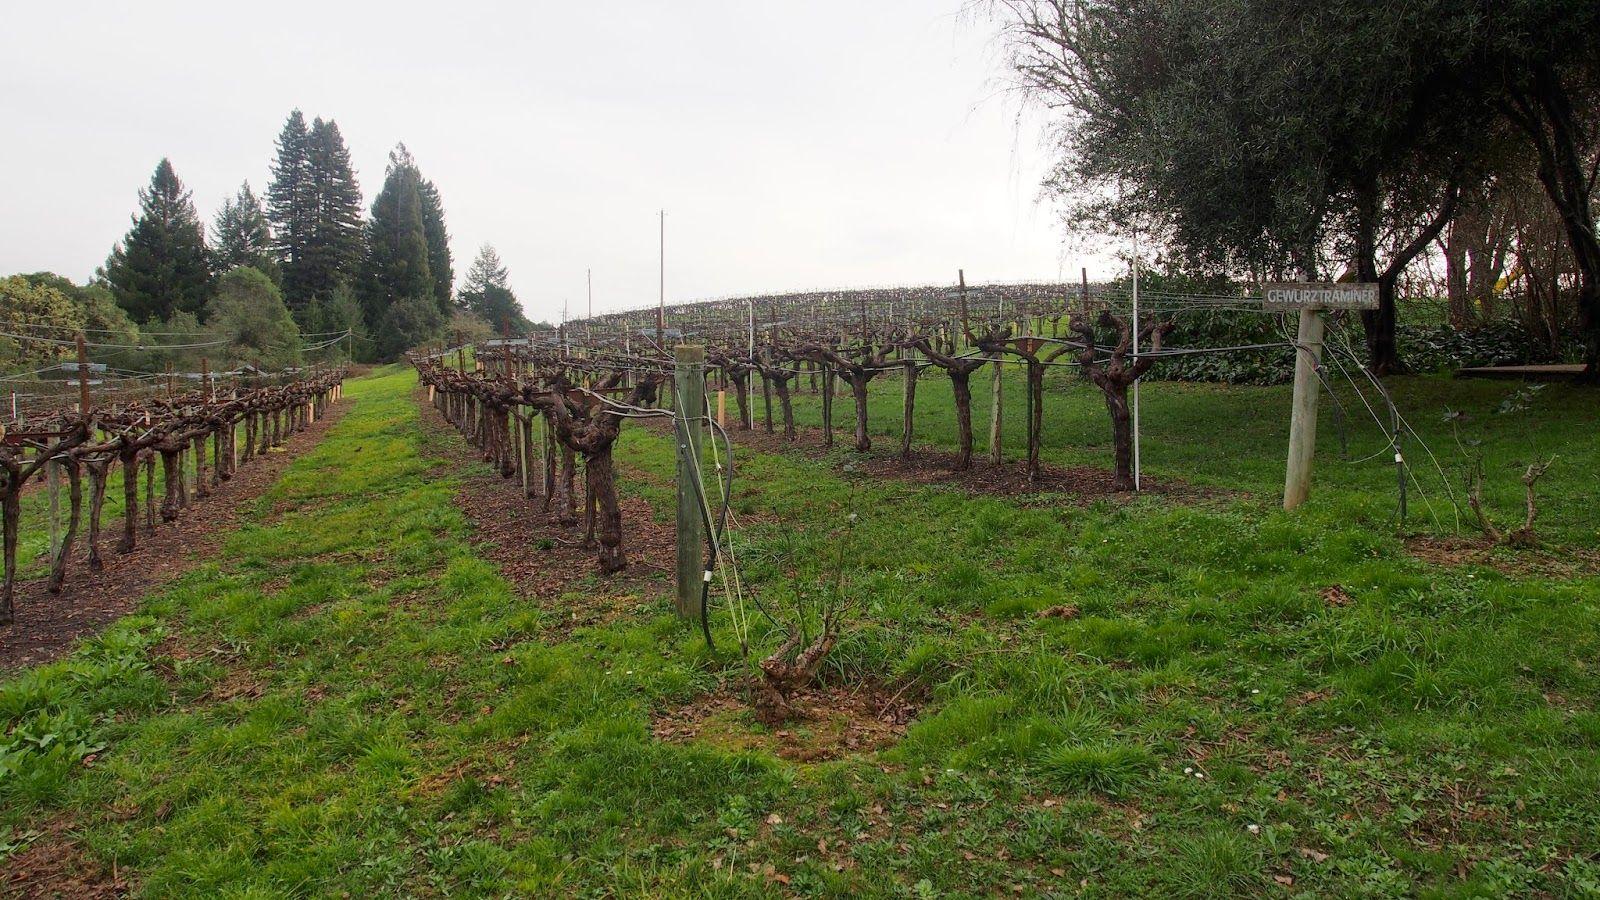 Italian Winestyle: Anderson Valley, California 2015